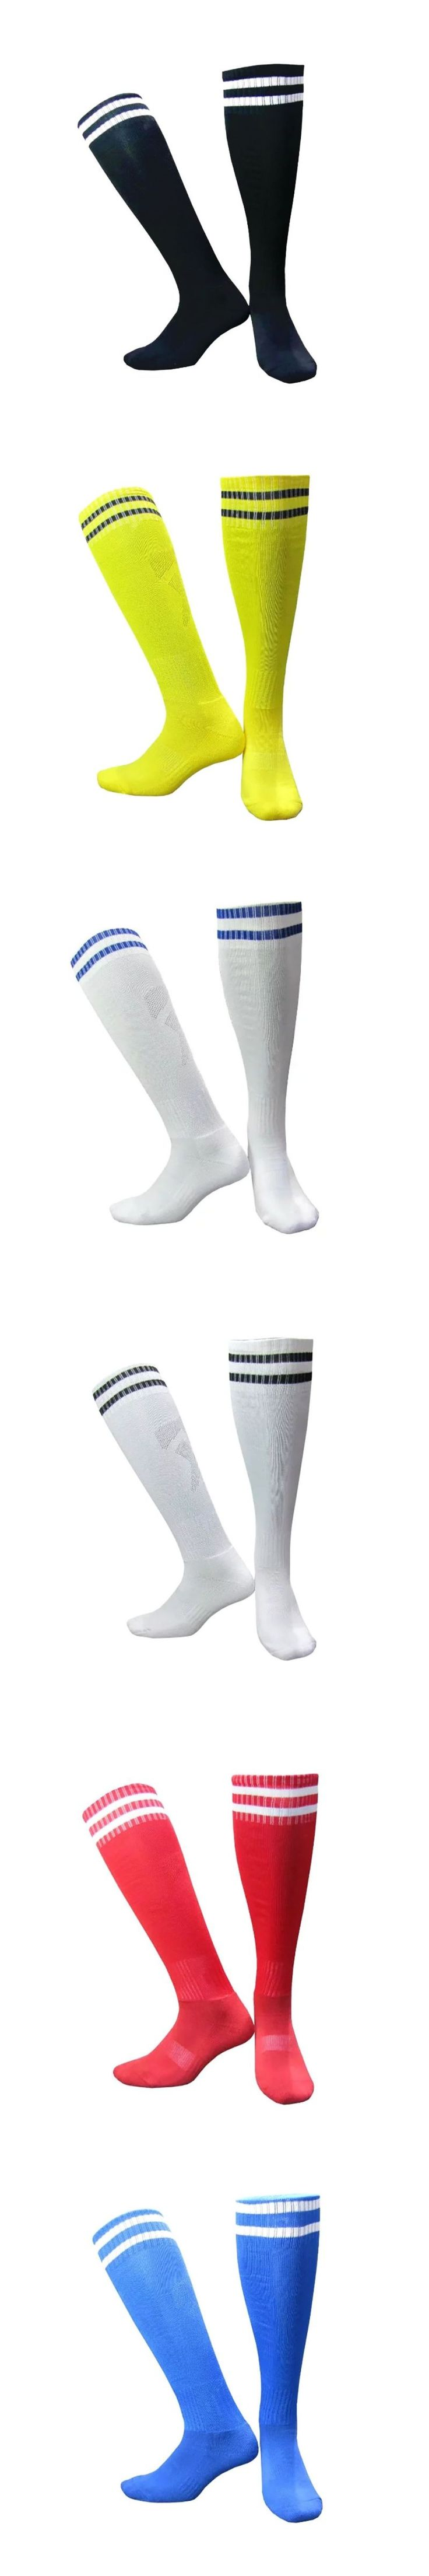 Man Compression Socks Tube Knee Striped Socks Over Knee High Sock Soft Leg Support Stretch Breathable Sock